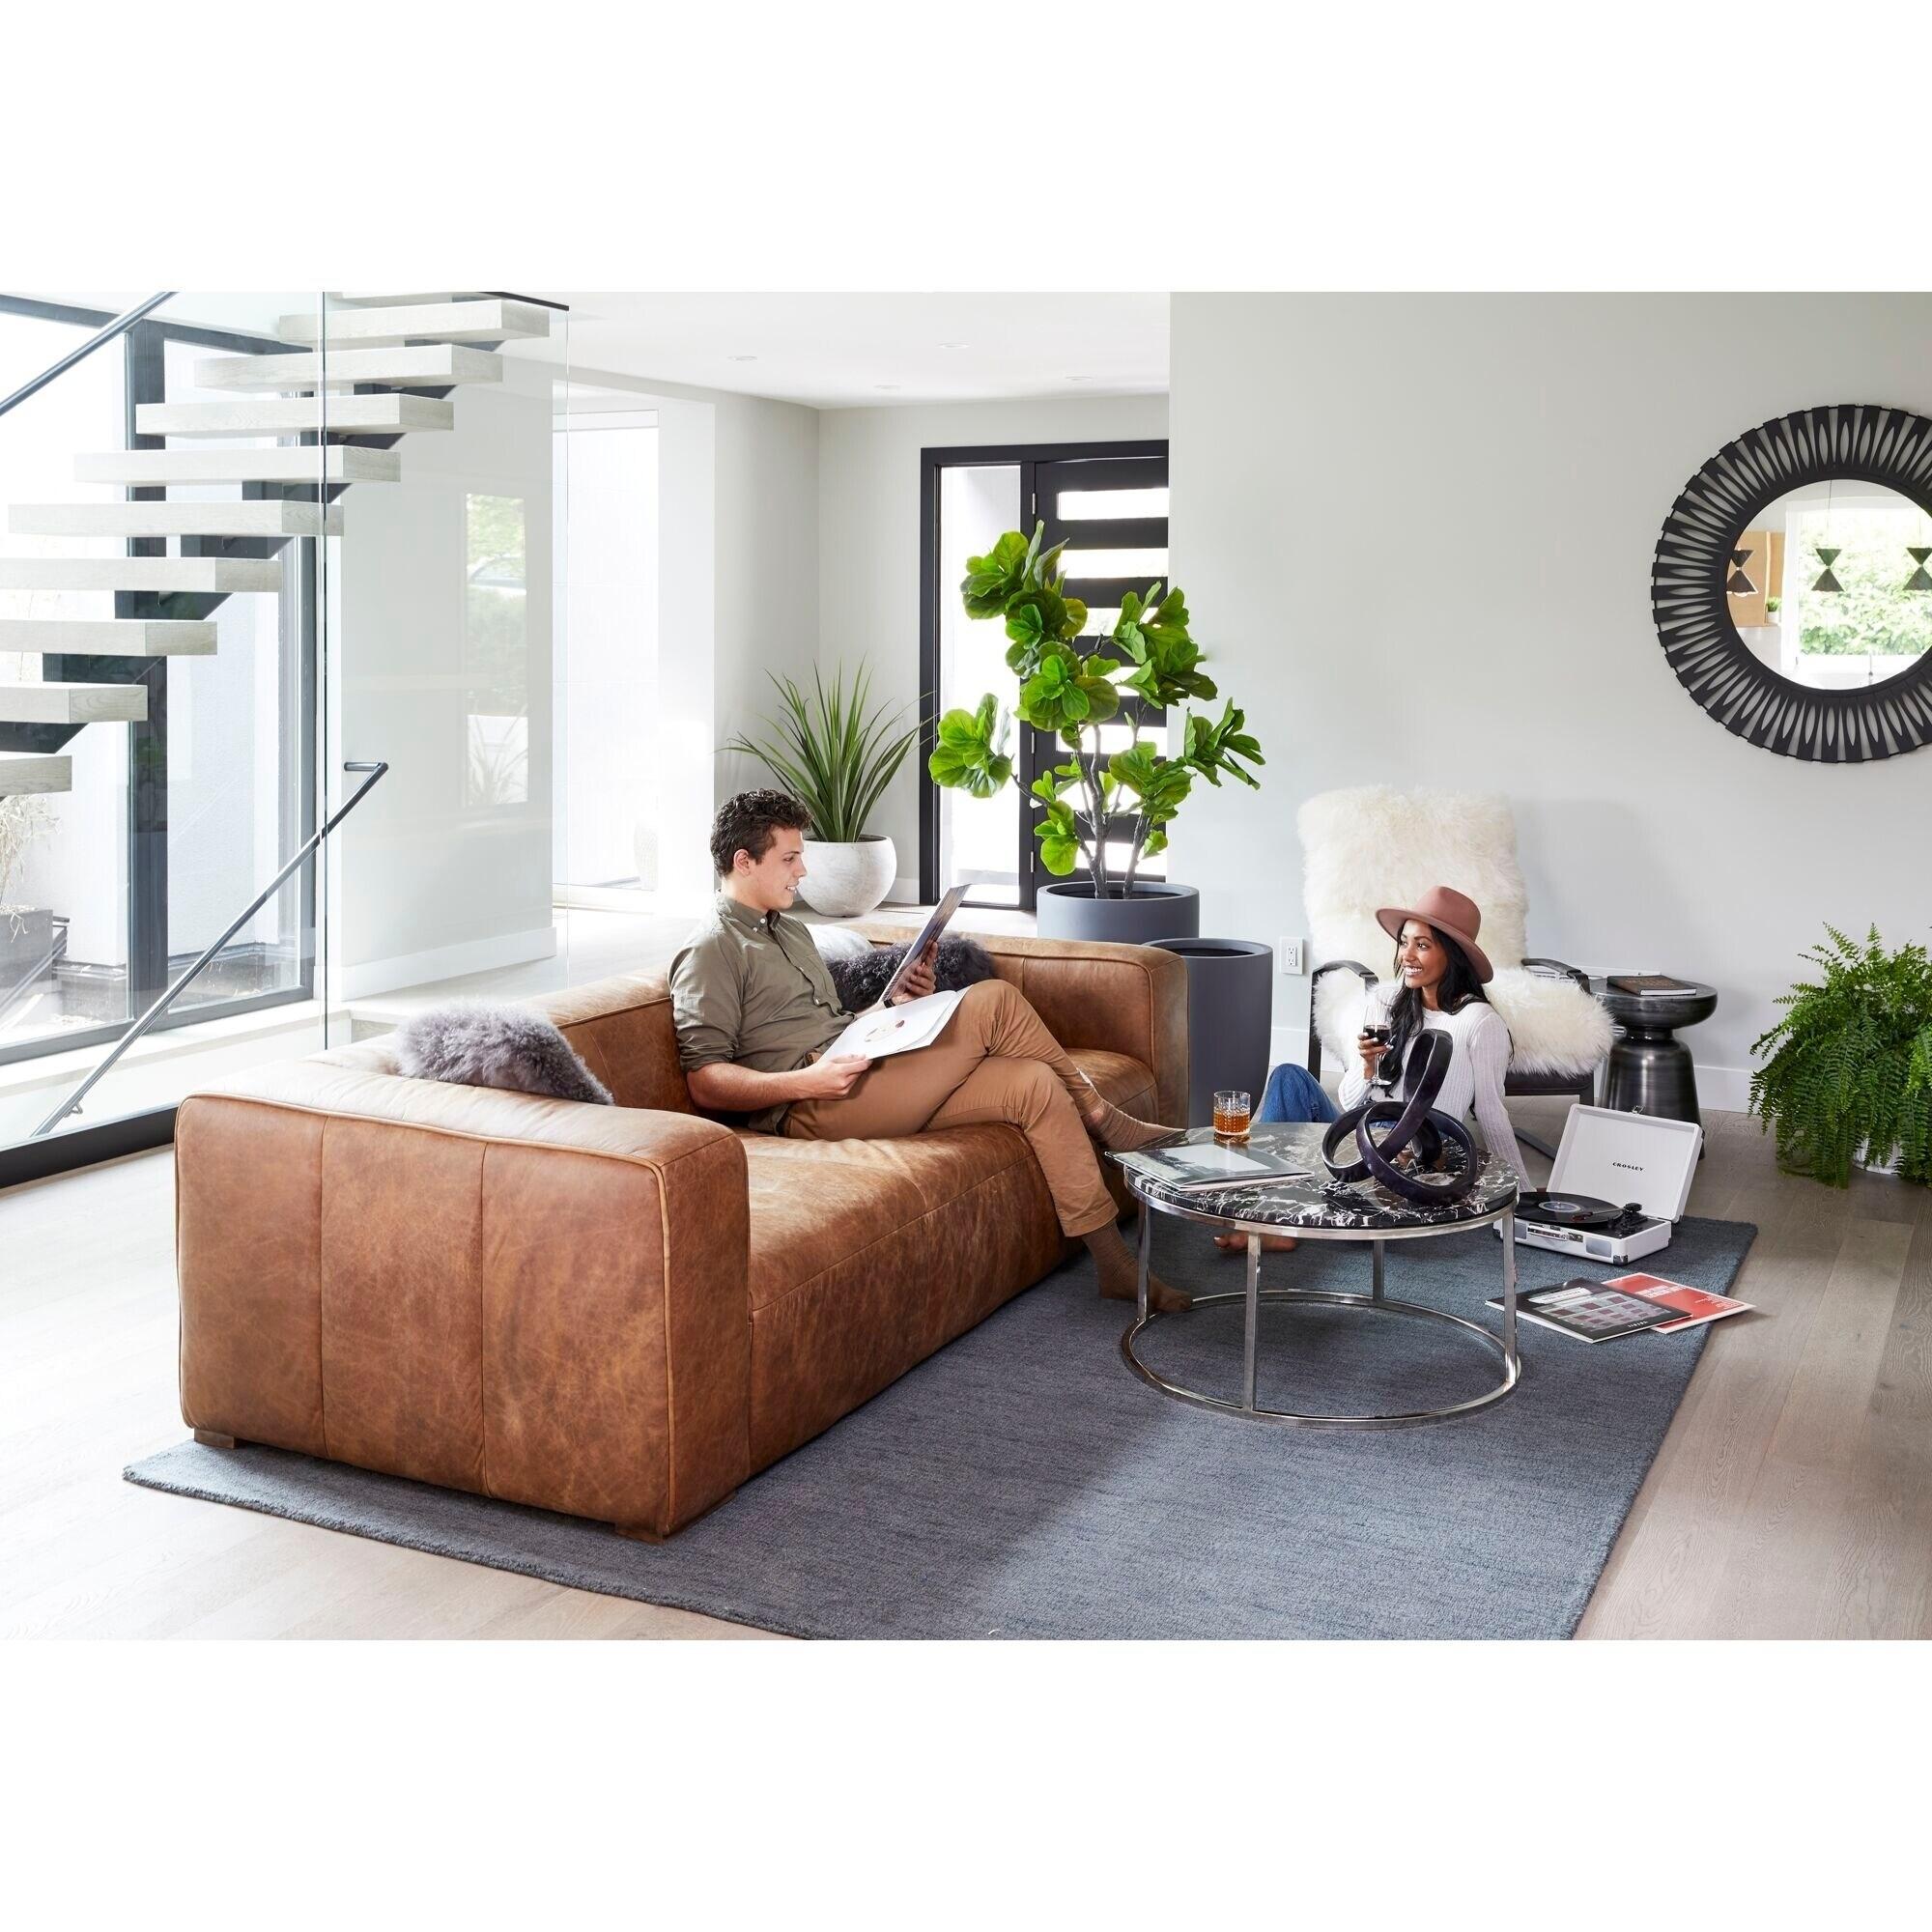 Wide Rustic Top Grain Leather Sofa